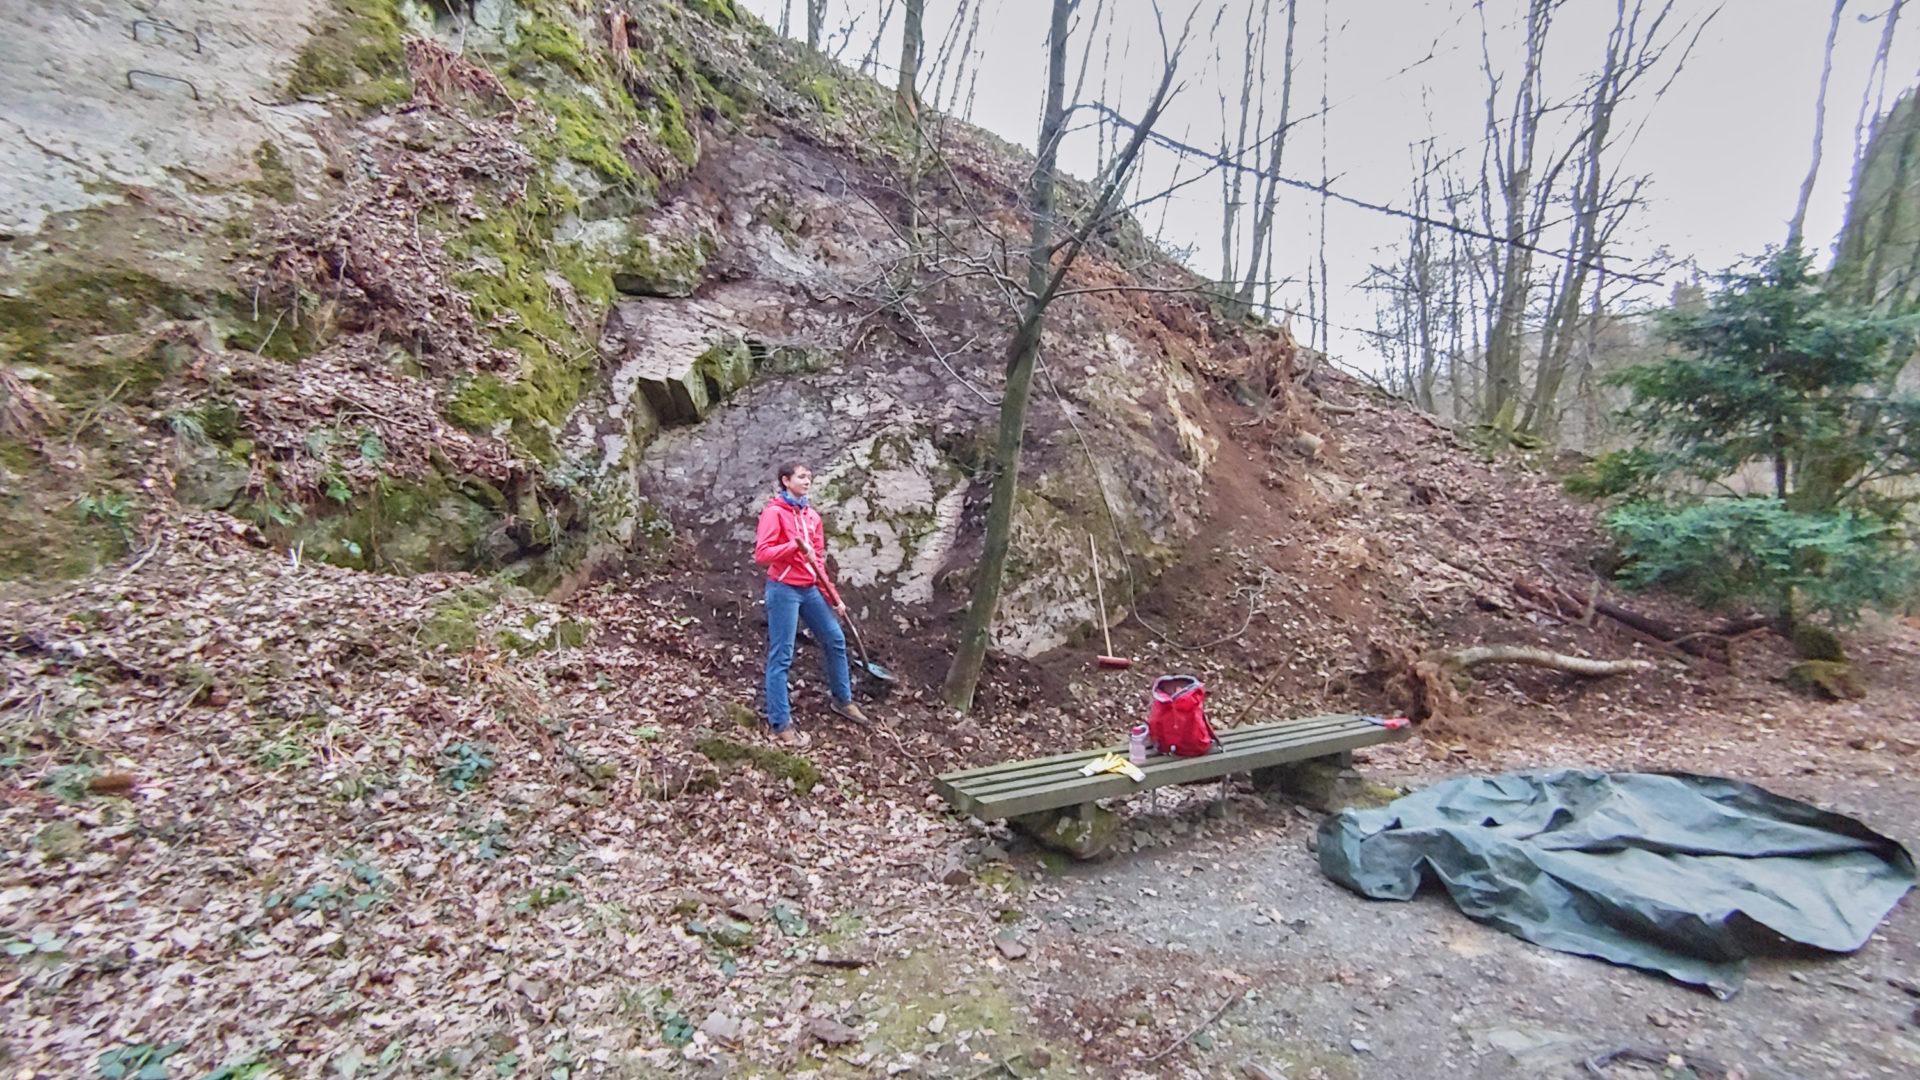 Spreeler Mühle Felsberäumung 2021